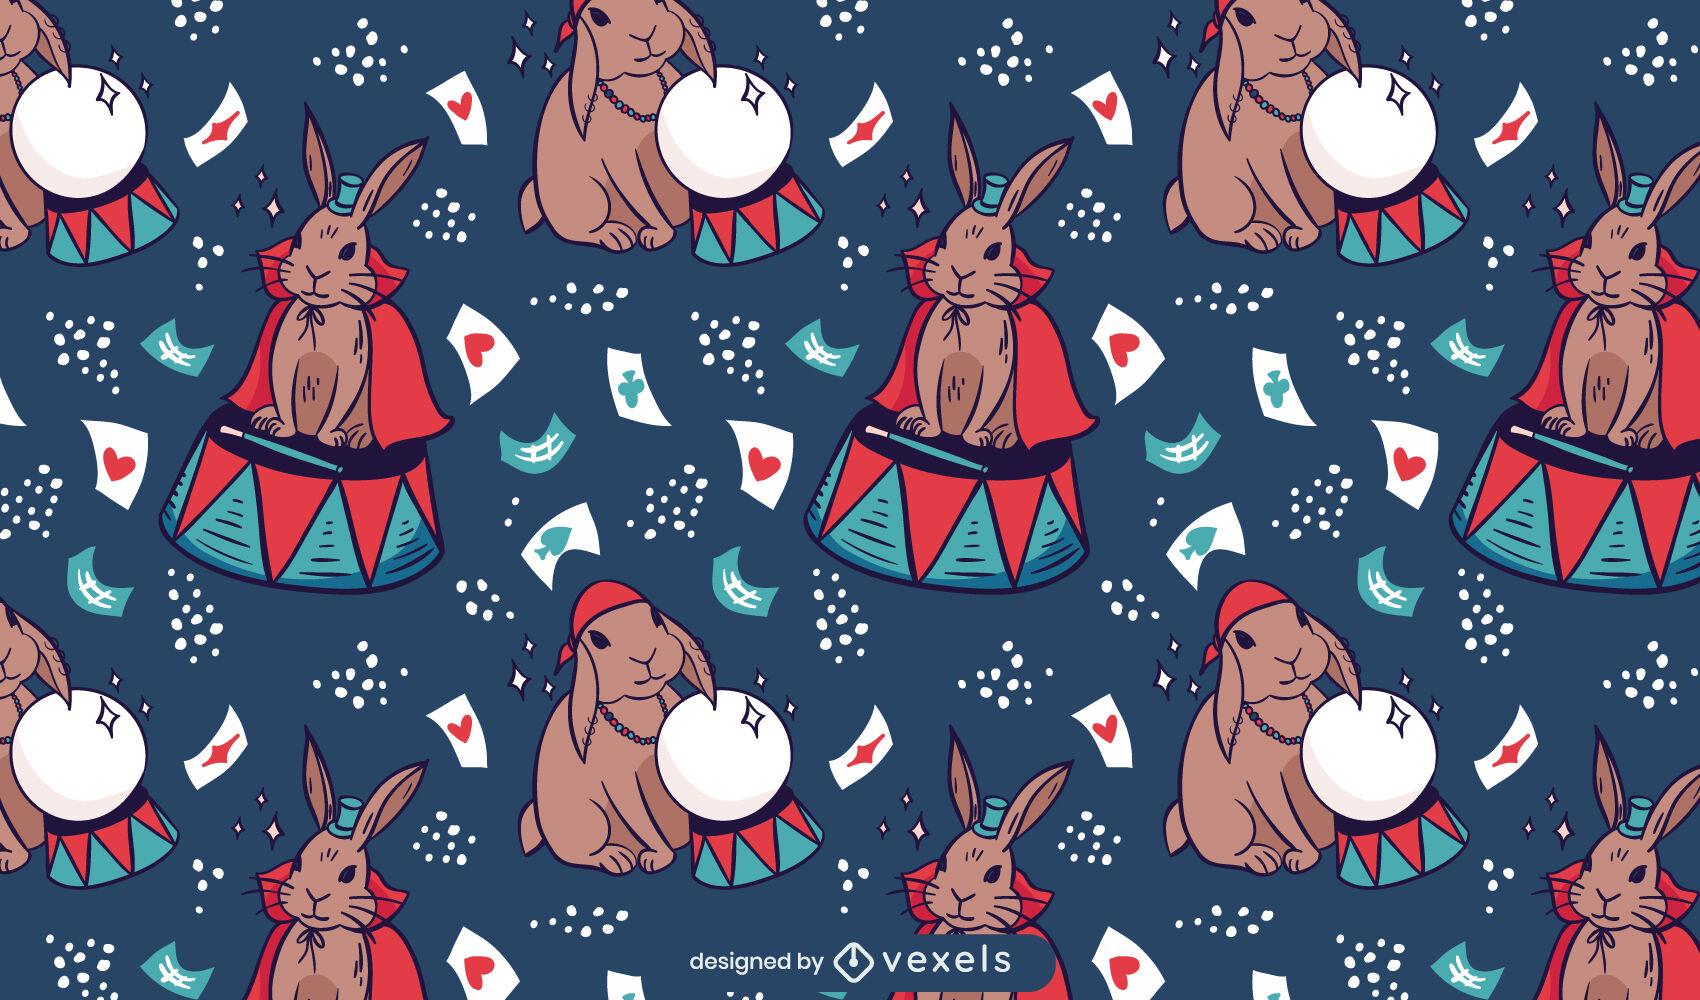 Circus rabbit animals pattern design